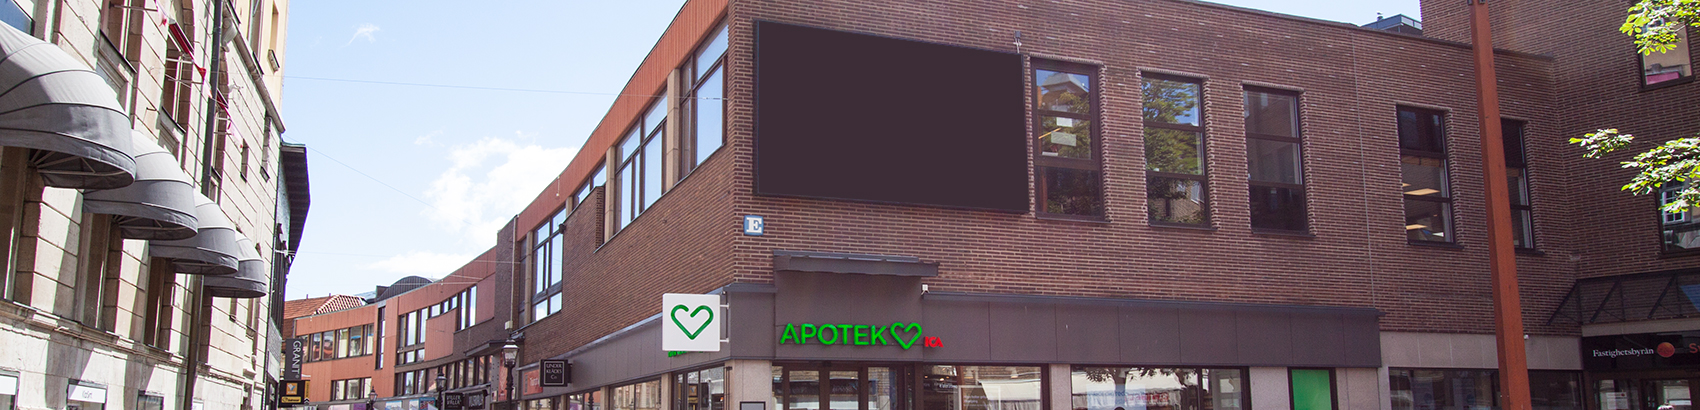 Ledig lokal mitt i Jönköping city